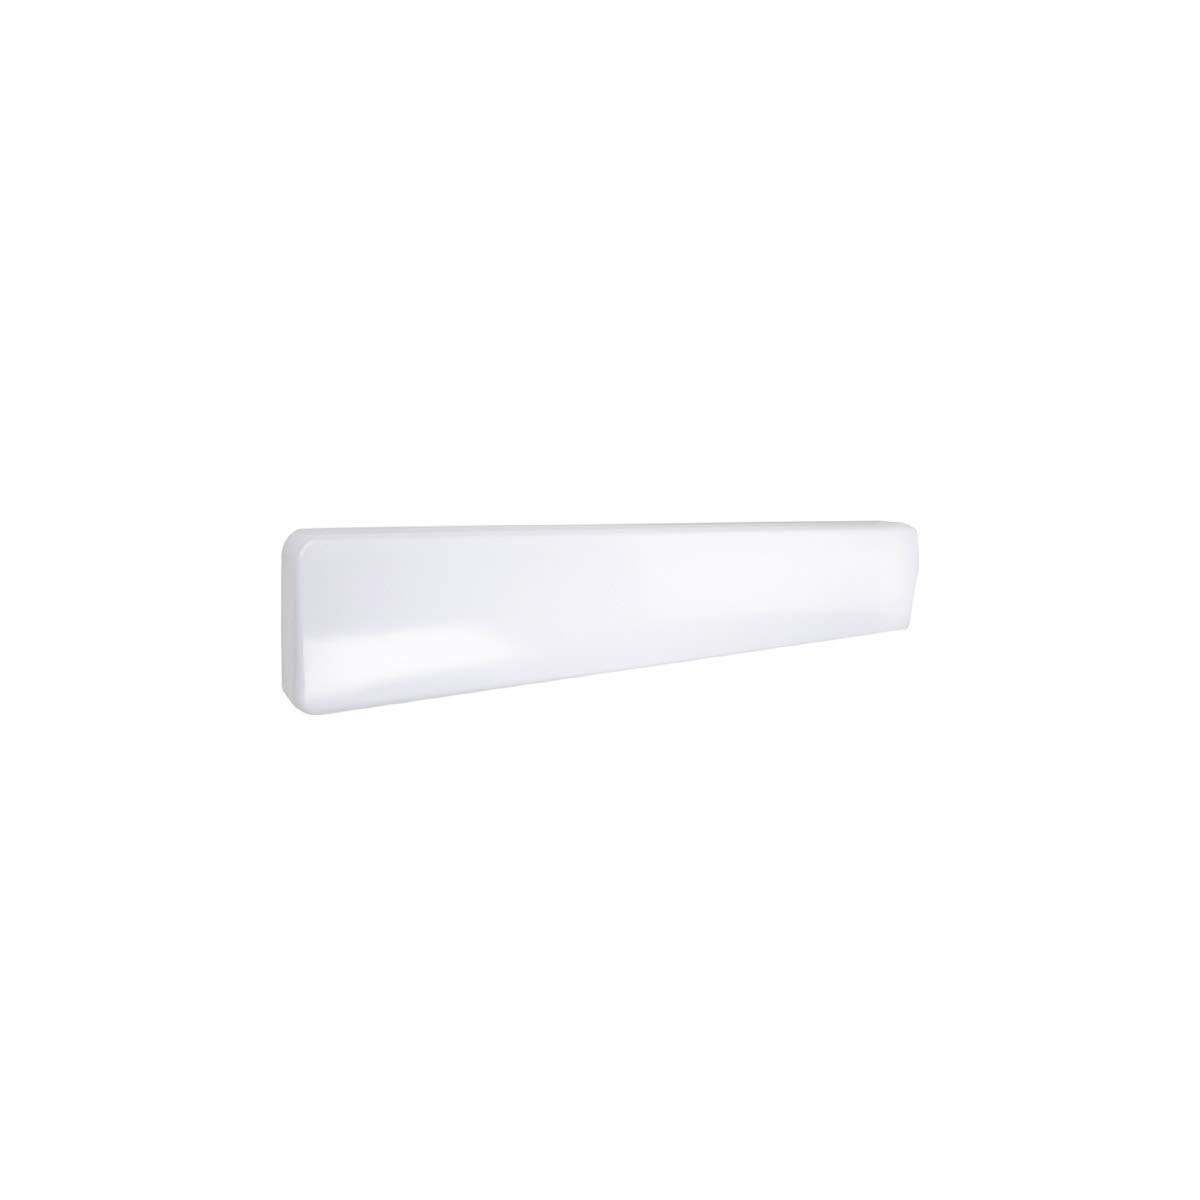 WAC Lighting WS-224G2-35-WT Flo Energy Star Bath Vanity Wall LED Bath Wall Light, 24 Inches